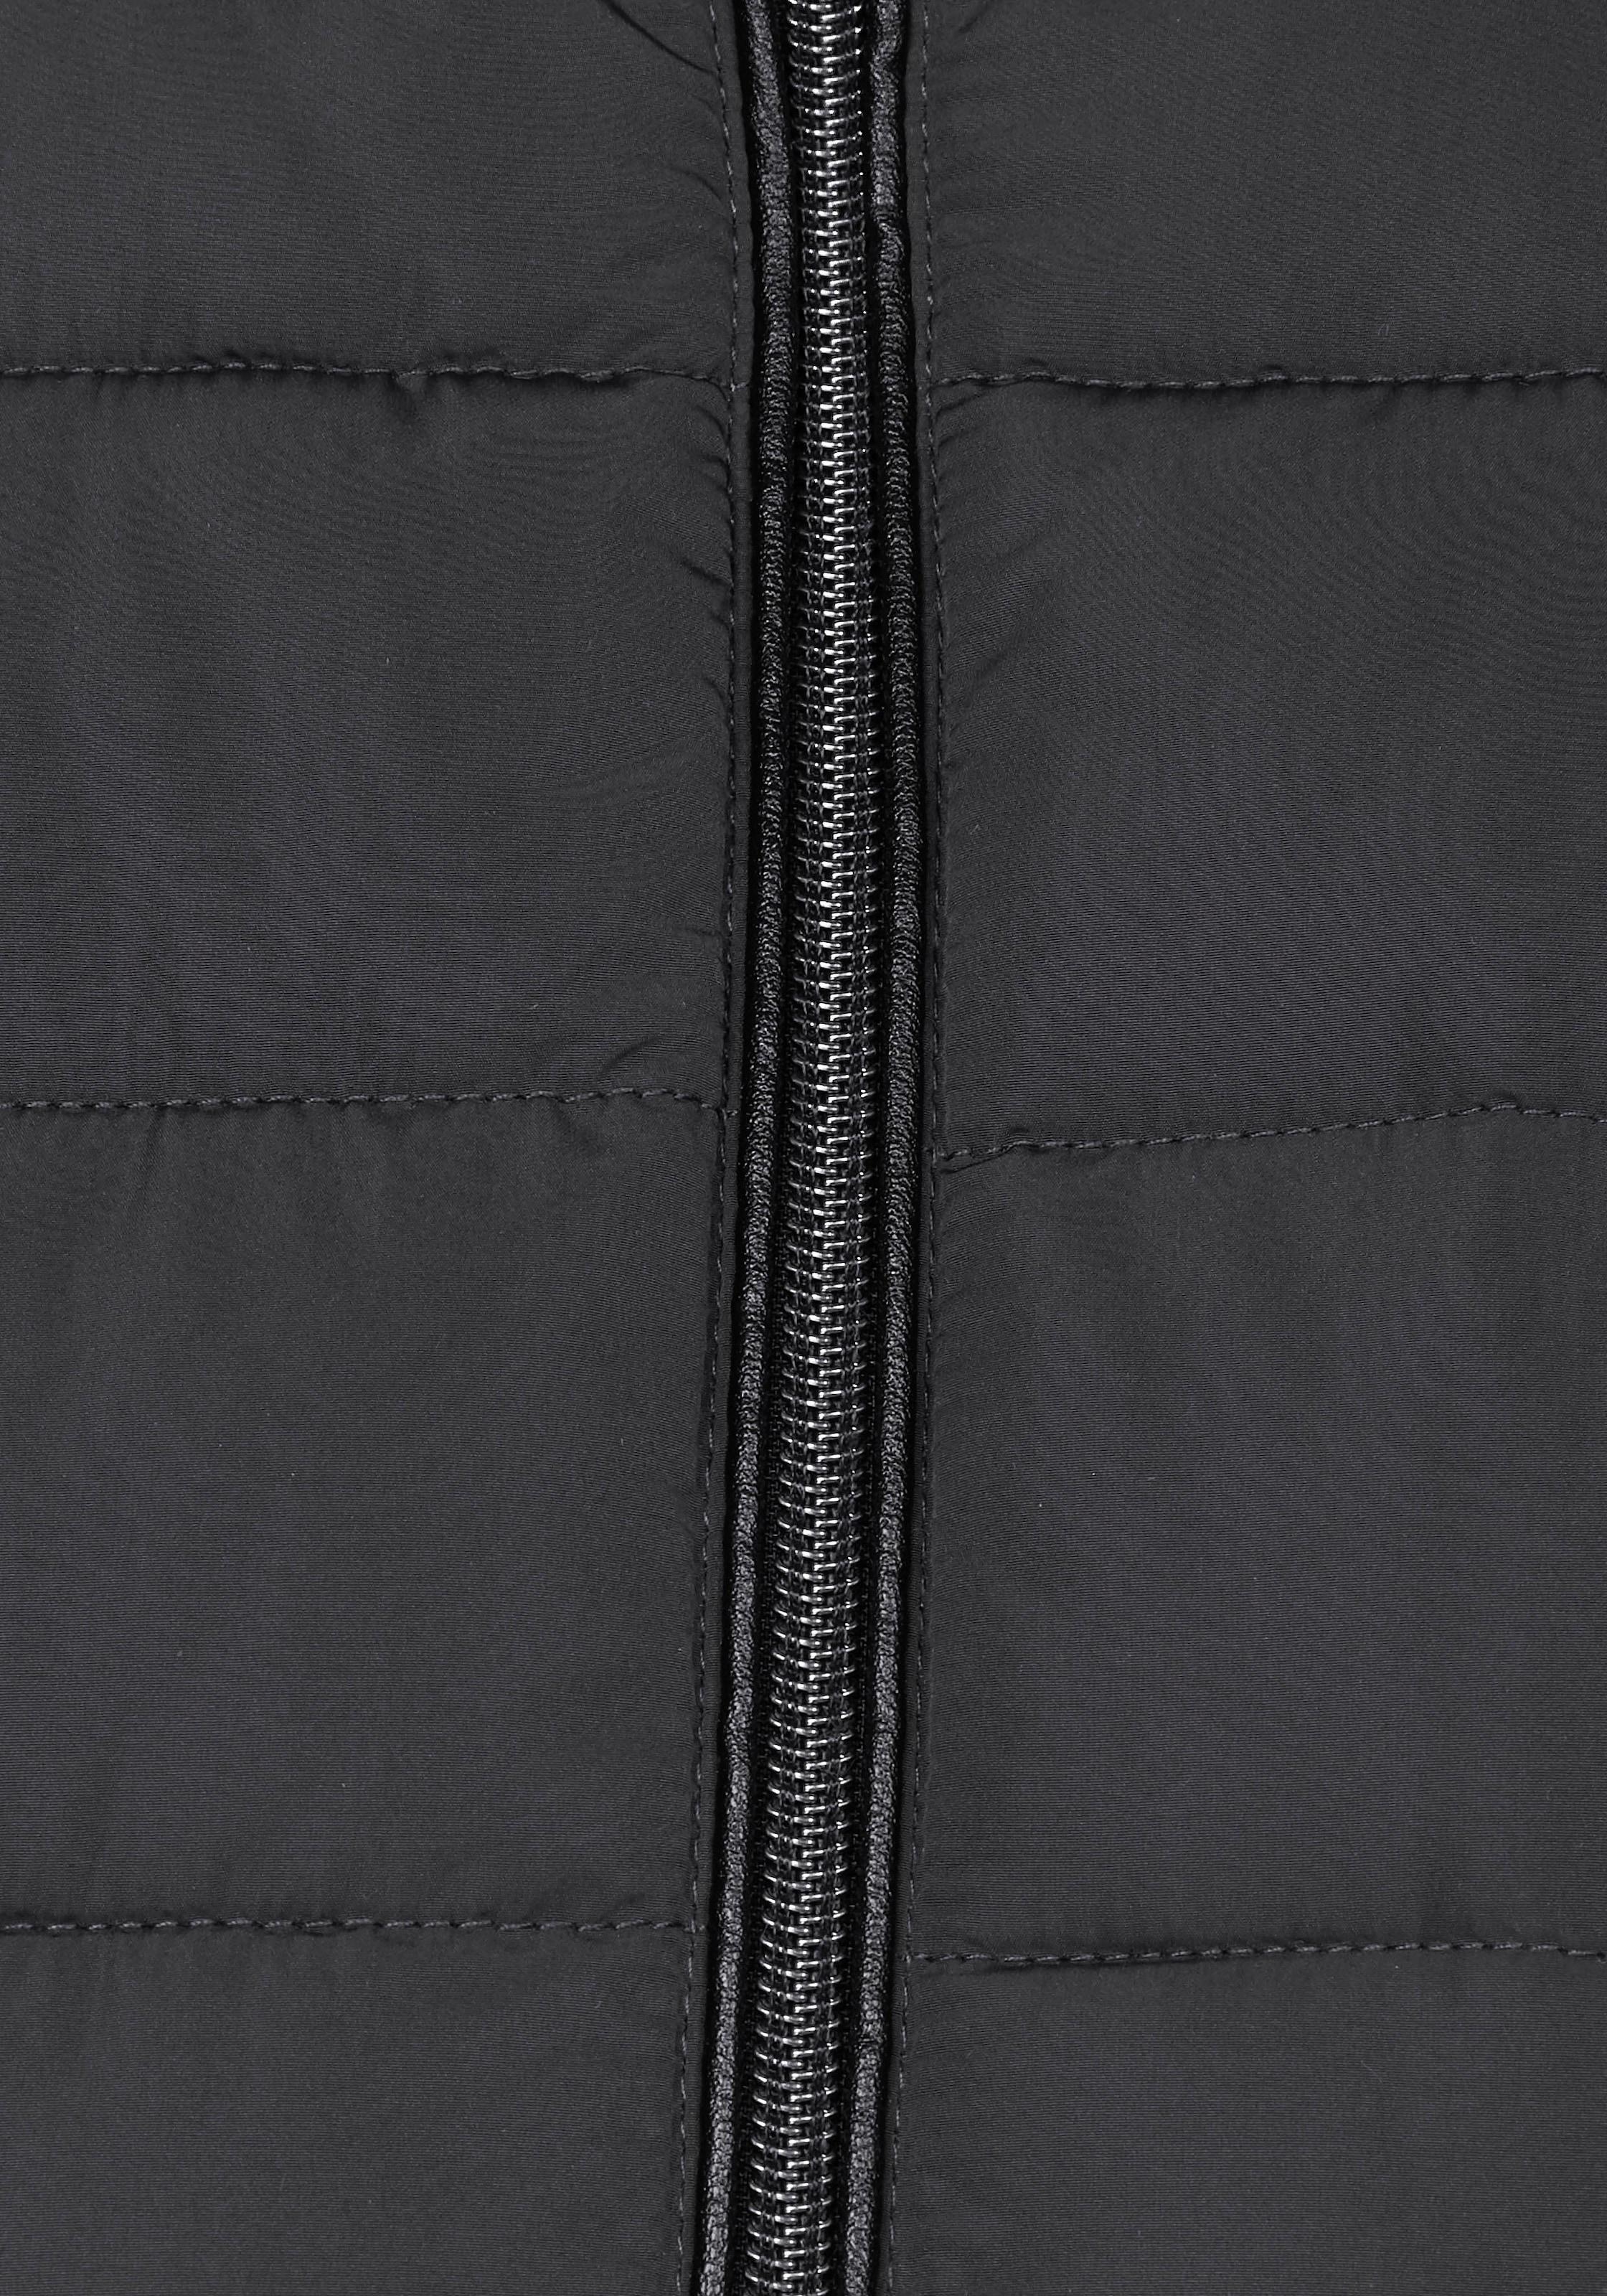 aniston casual steppjacke Kuschelig weiche Steppjacke im Daunen Look